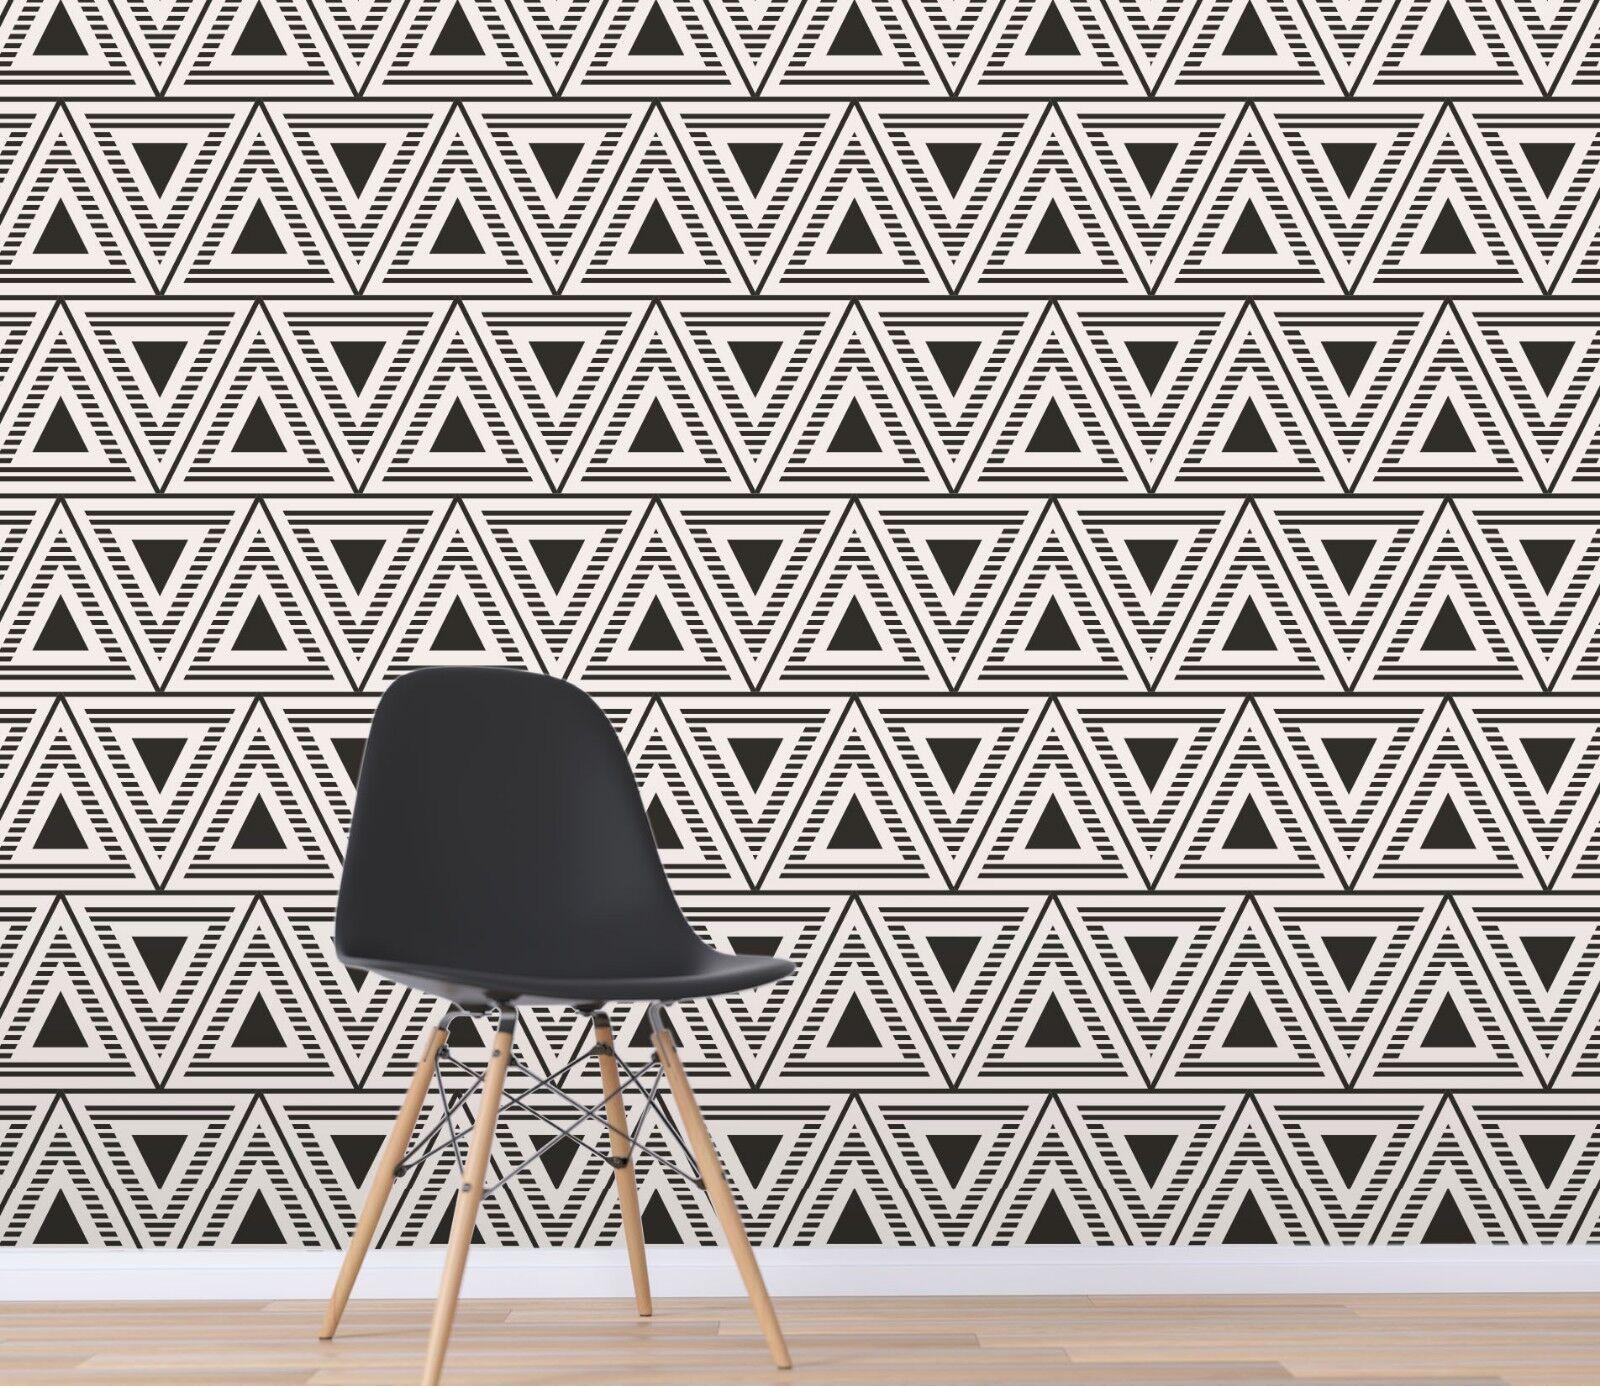 3D Modern Style Triangle 33 Wallpaper Mural Wall Print Decal Indoor Murals AU